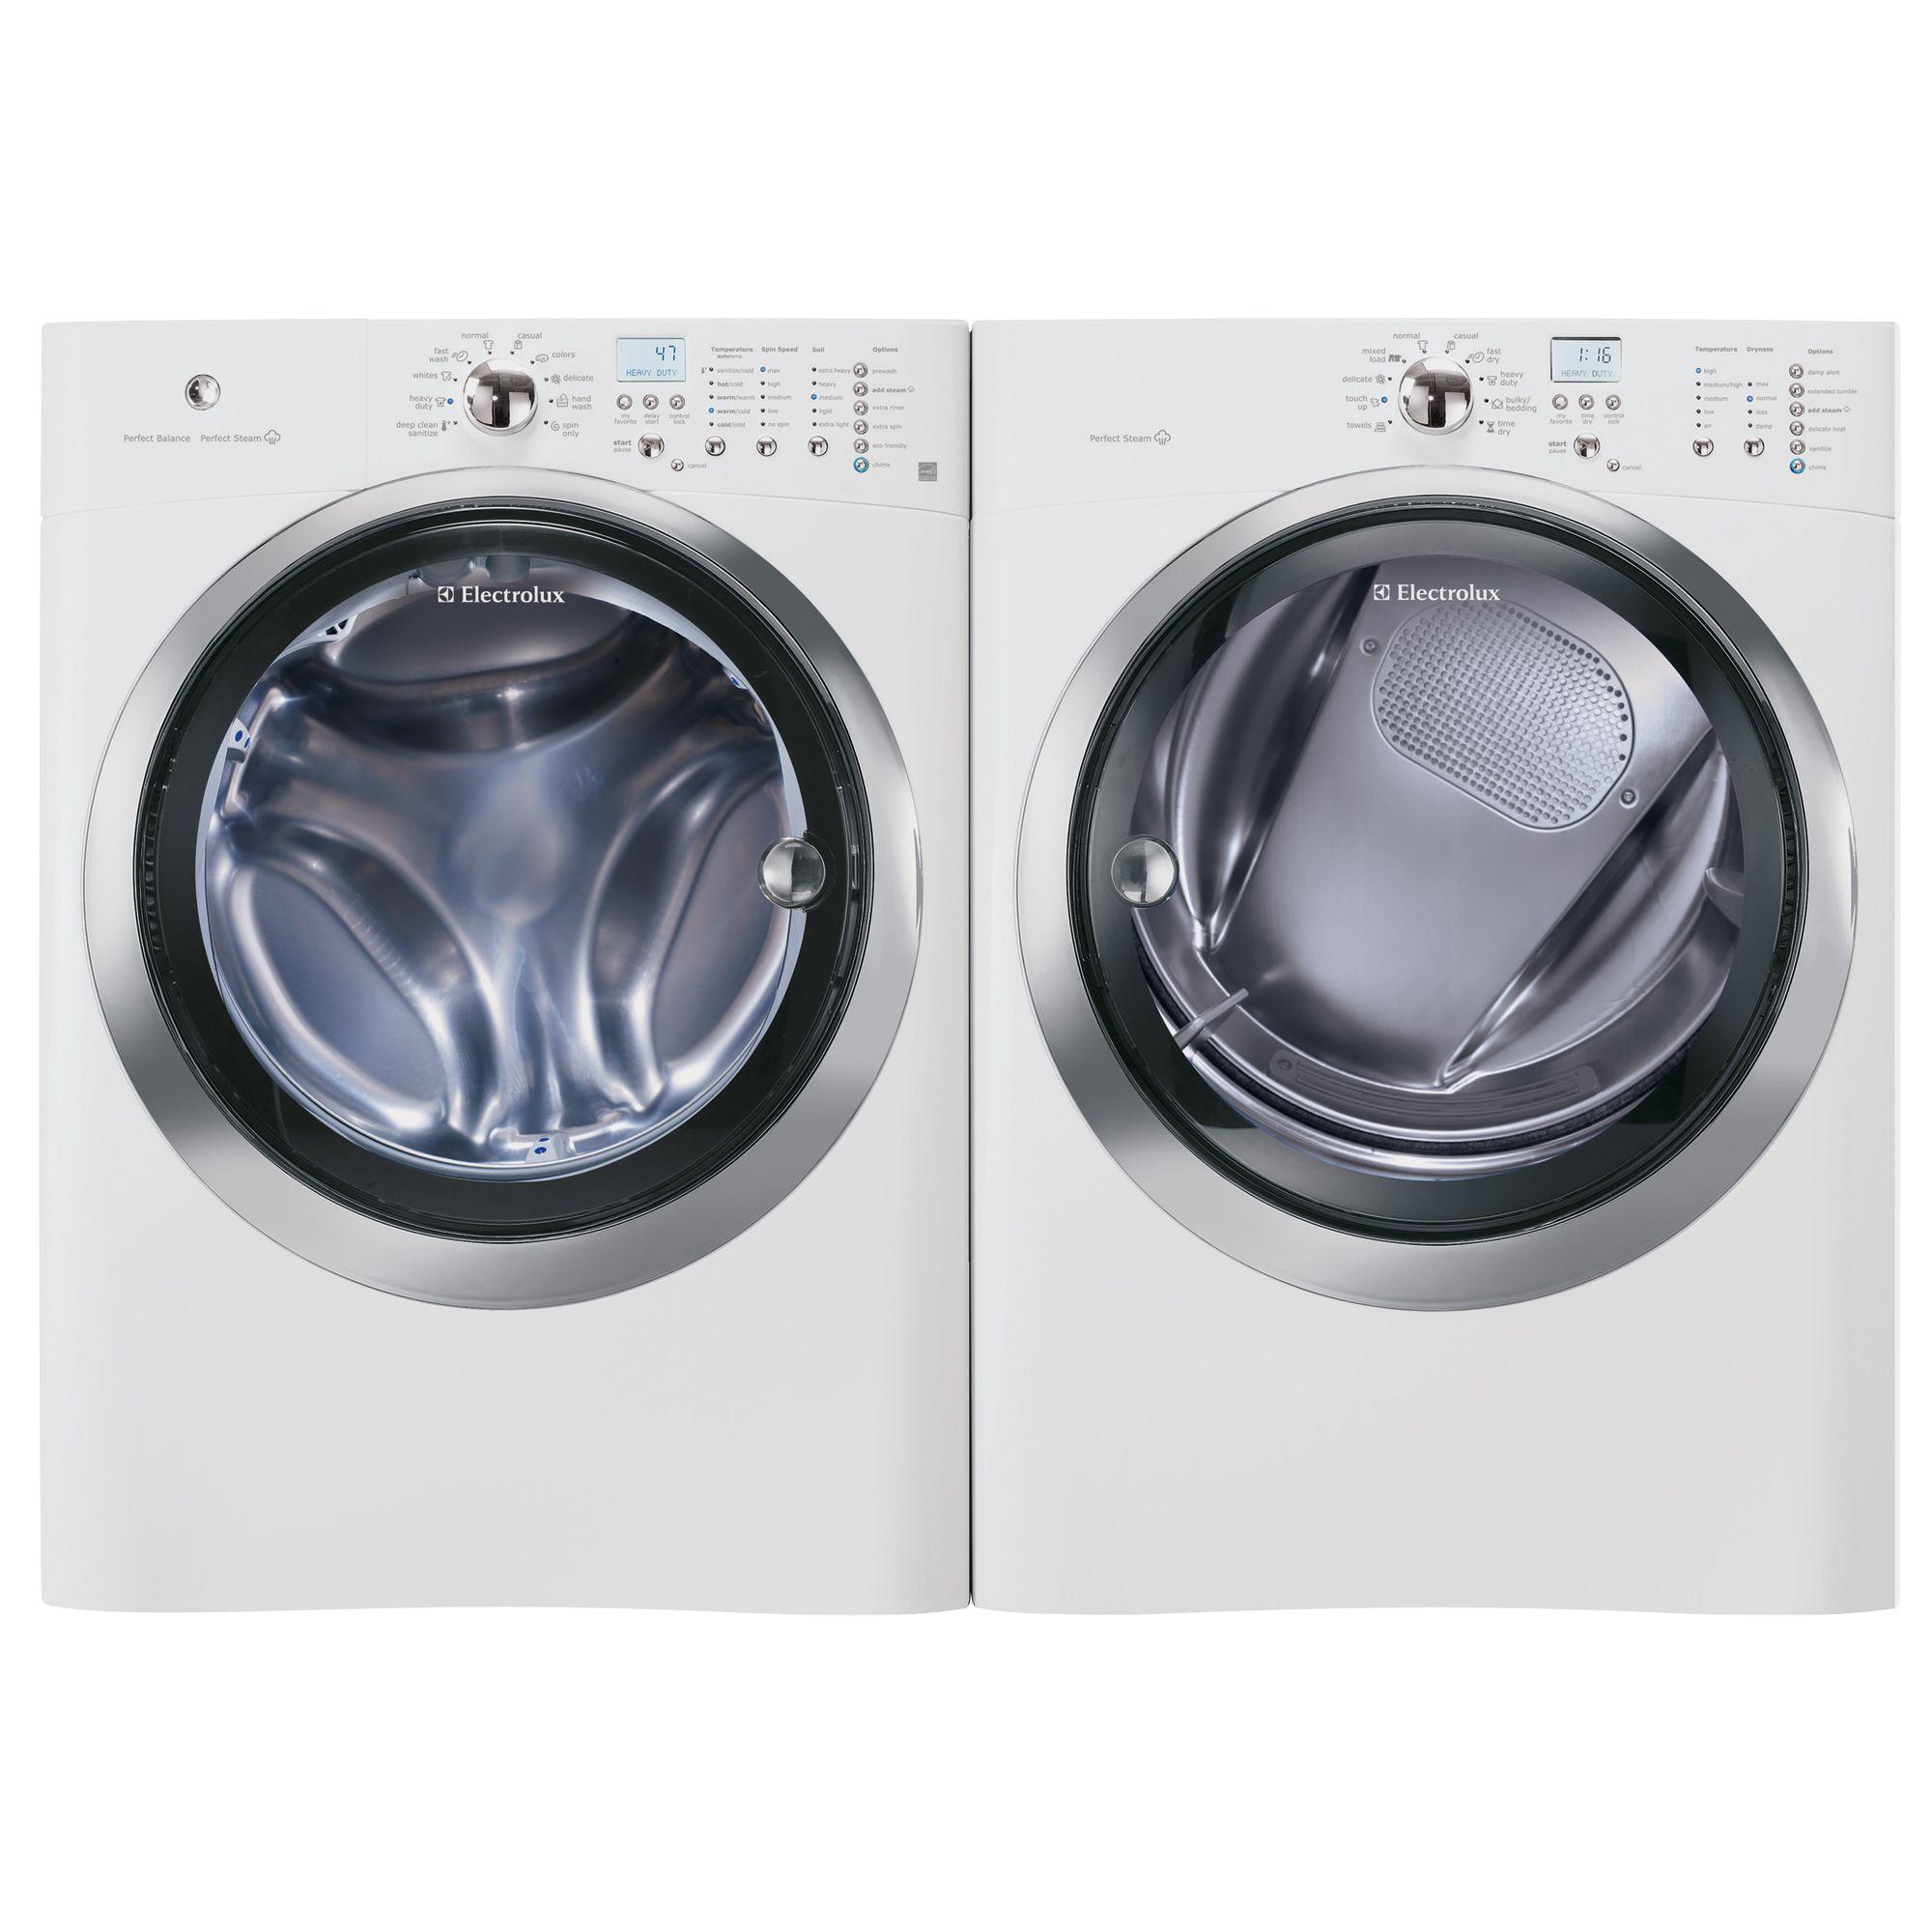 Electrolux EIMGD55IIW IQ-Touch™ 8.0 cu. ft. Gas Steam  Dryer - Island White